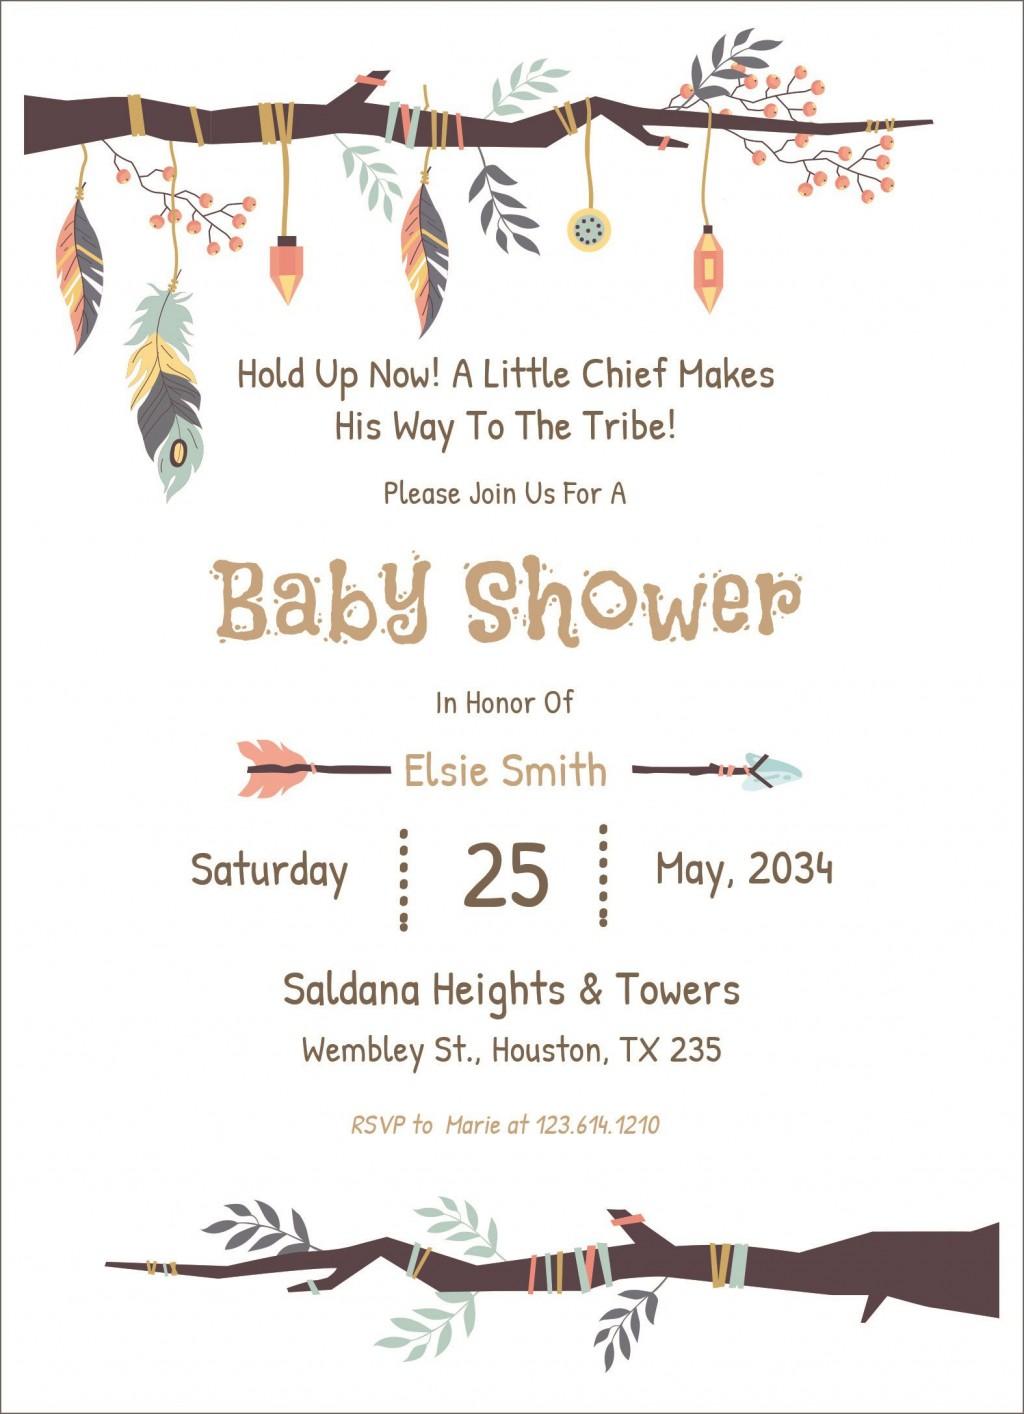 002 Wondrou Baby Shower Invitation Free Template Design  Templates Online Printable E-invitation Card DownloadLarge